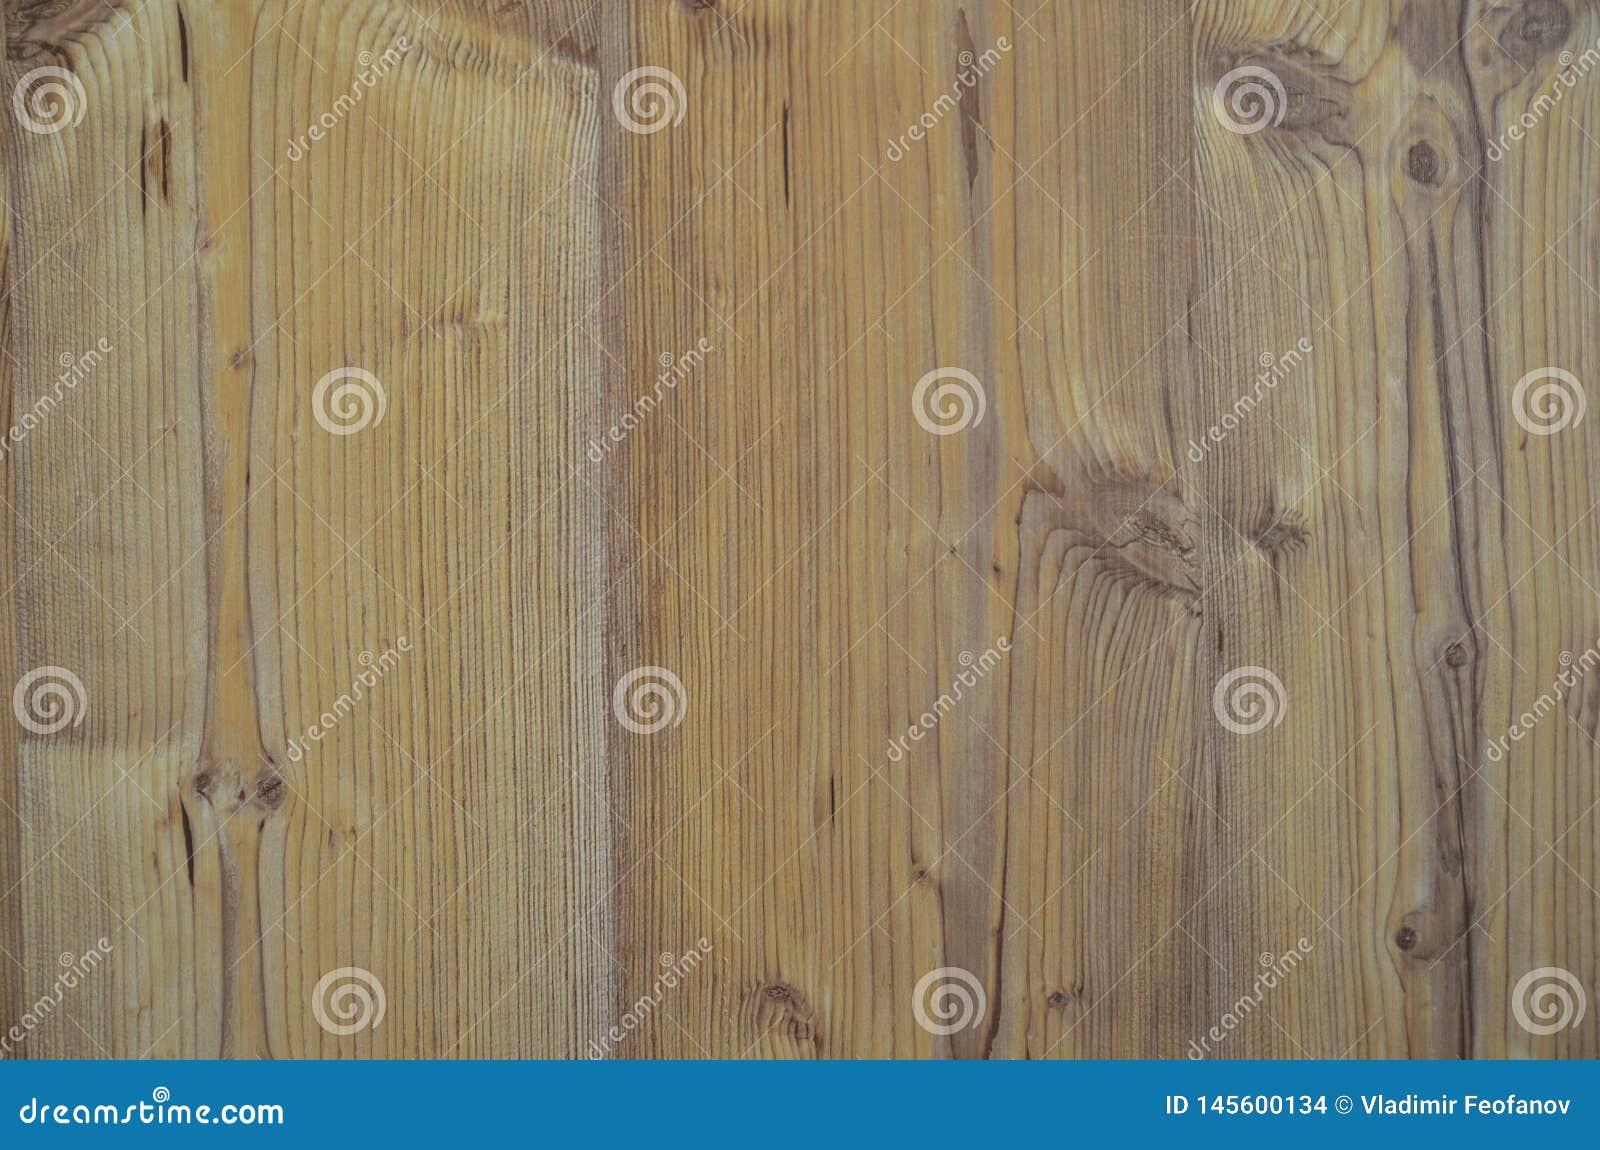 Rocznika t?a drewniana tekstura z k?pkami i gw??d? dziurami